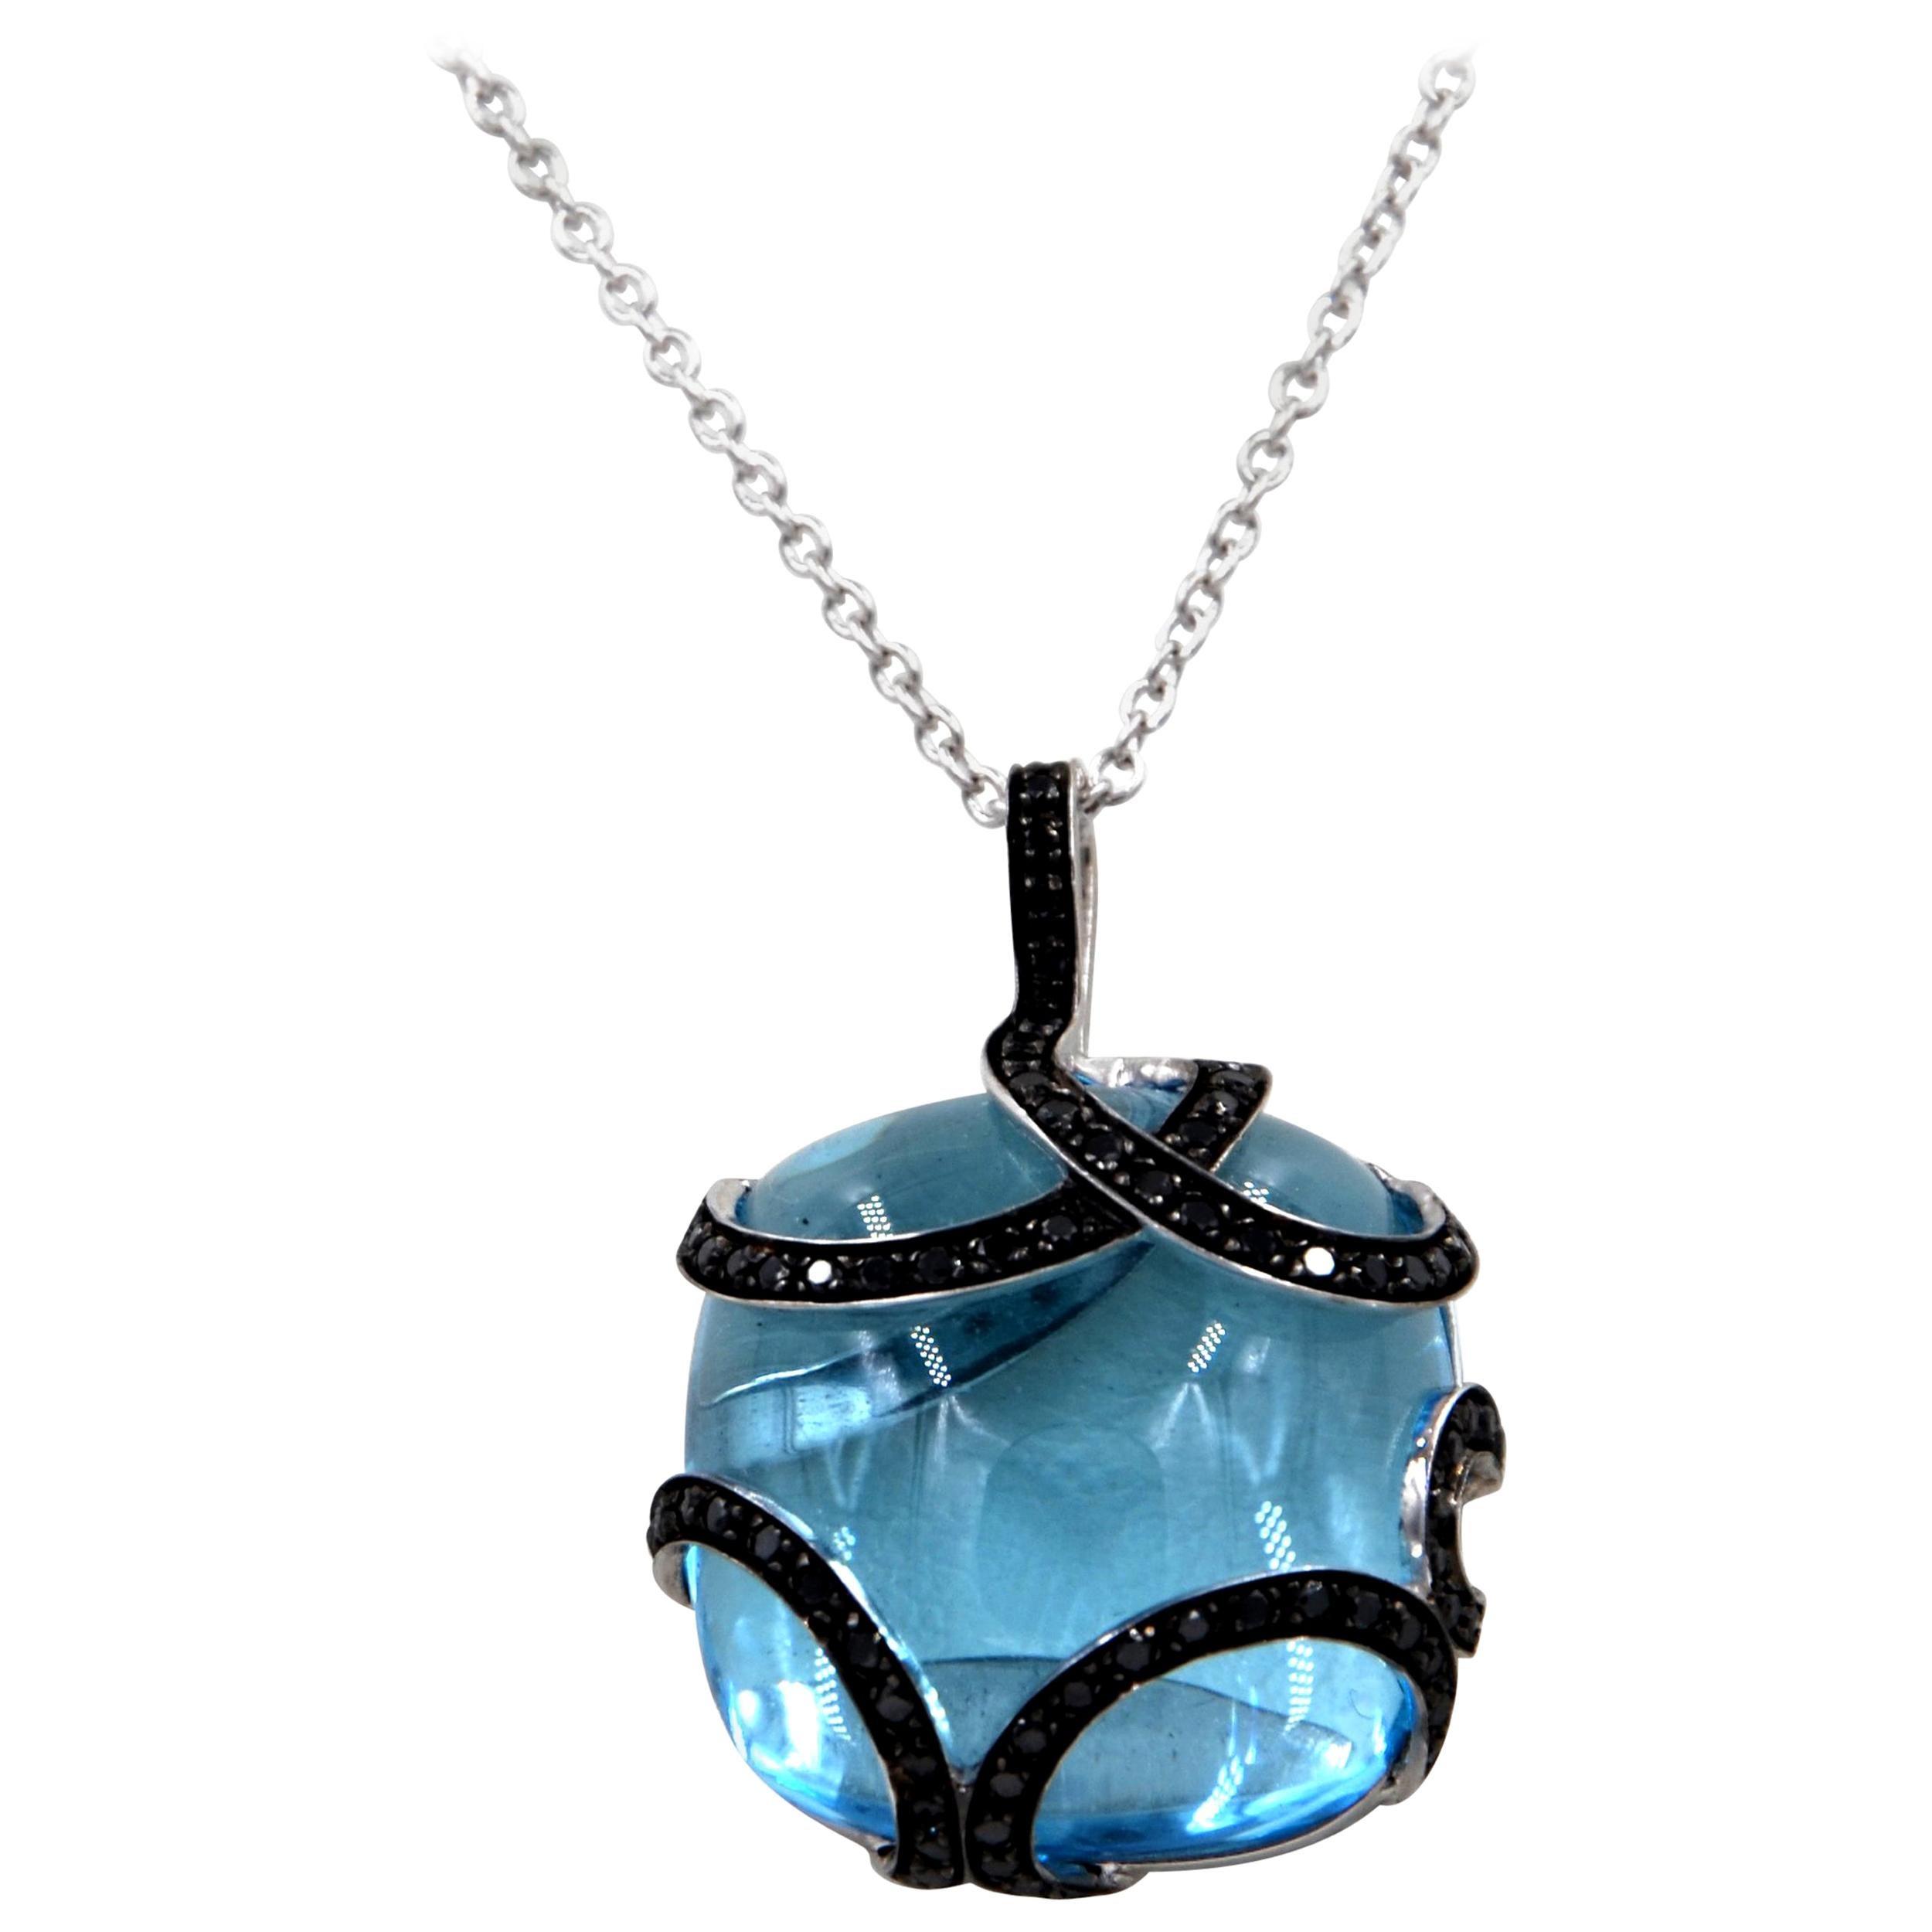 18 Karat White Gold Blue Topaz Black Diamonds Garavelli Pendant Necklace